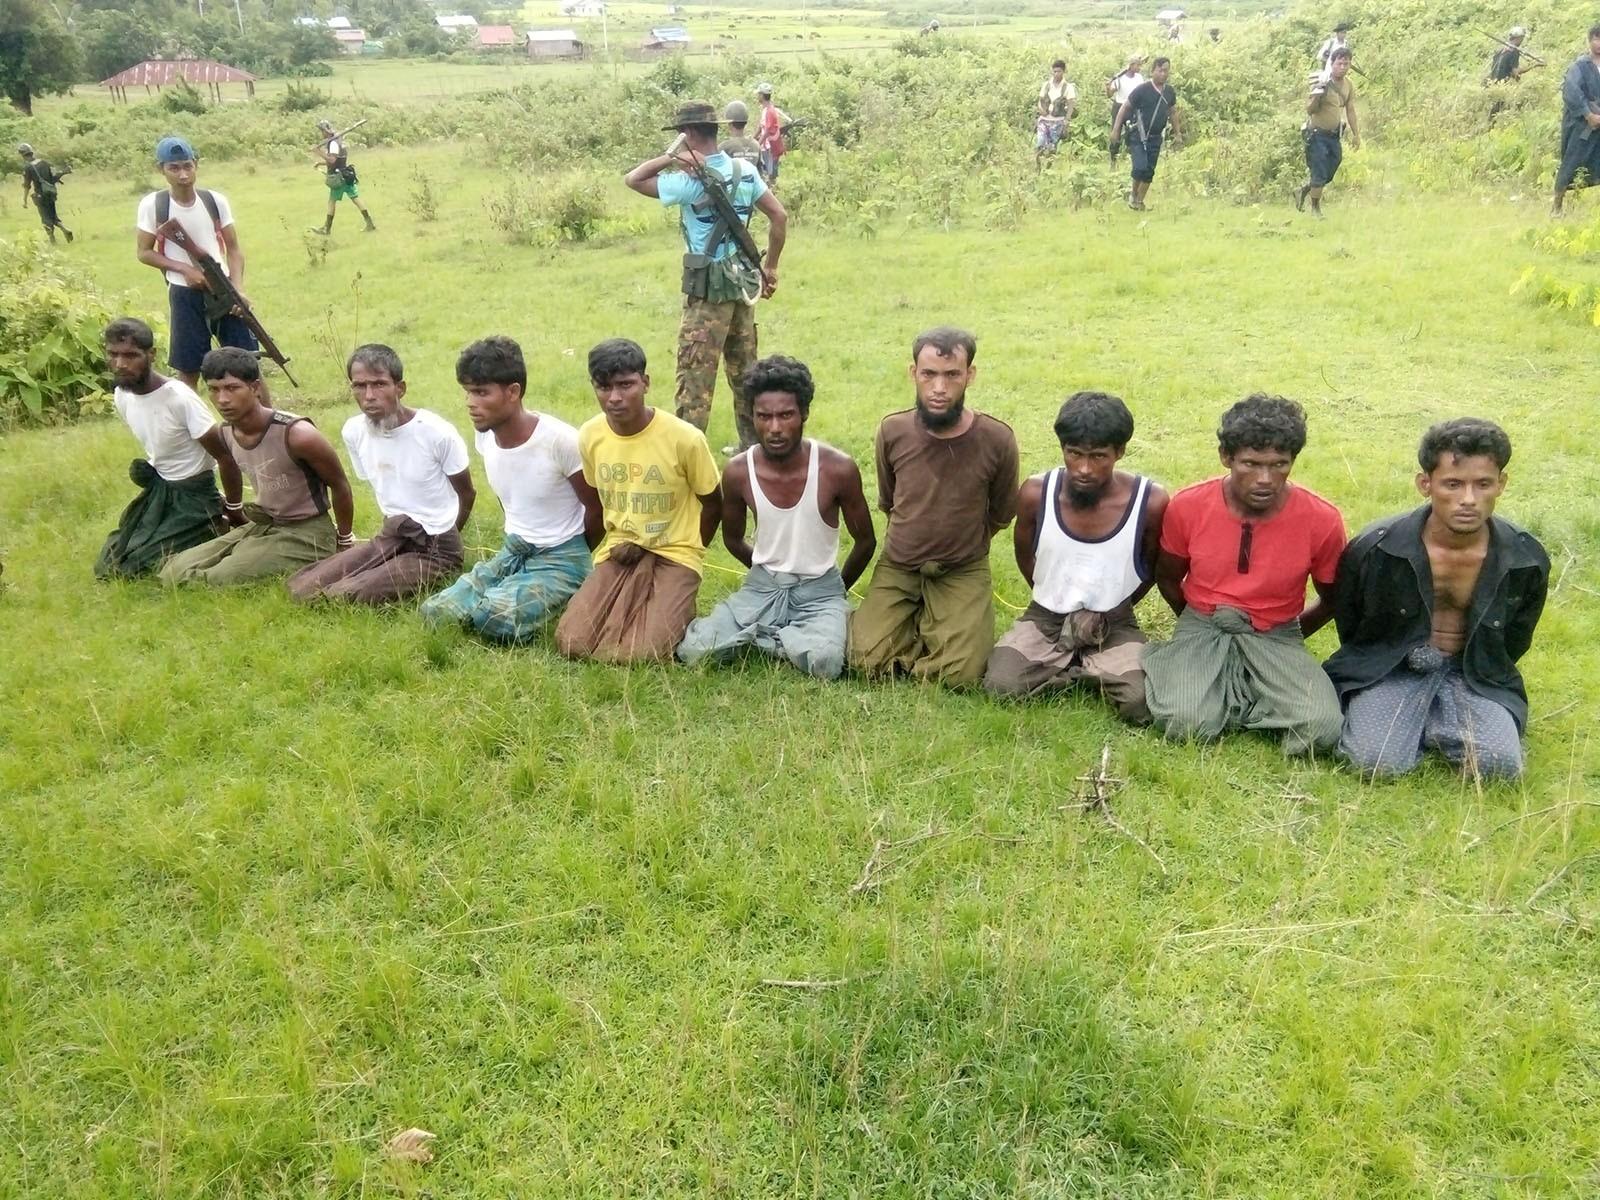 Ten Rohingya Muslim men with their hands bound kneel as members of the Myanmar security forces stand guard in Inn Din village September 2, 2017.